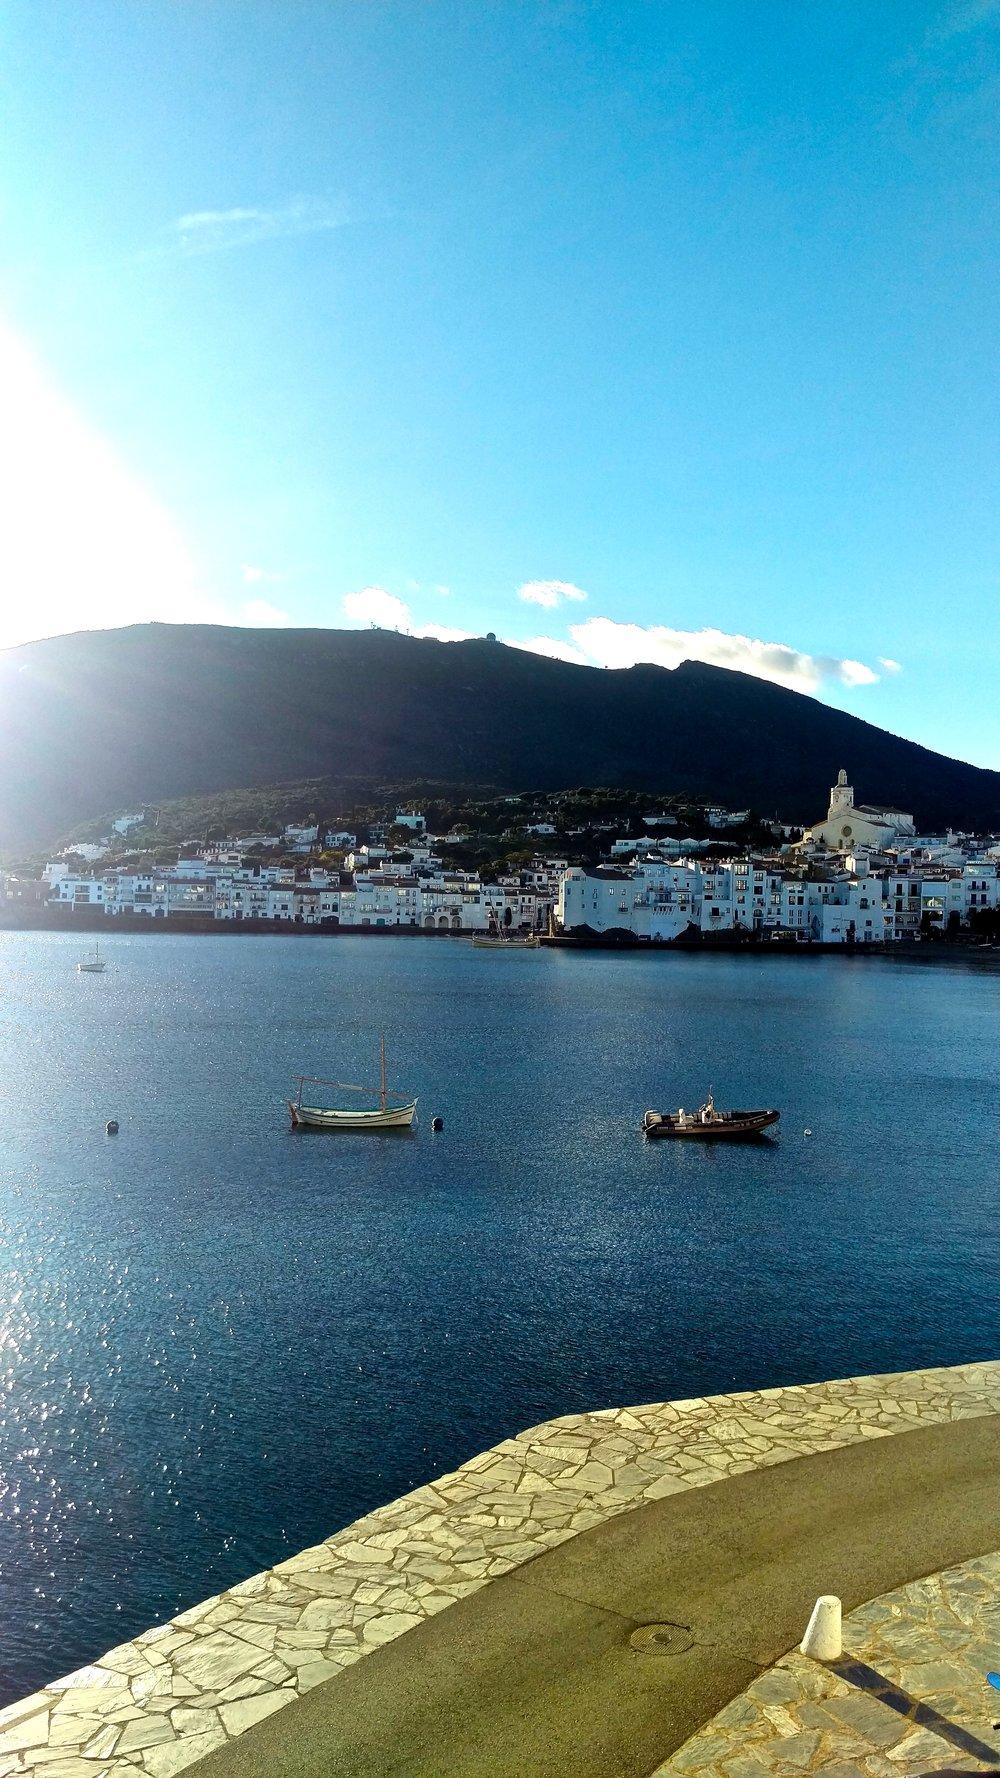 Bay view of Cadaqués